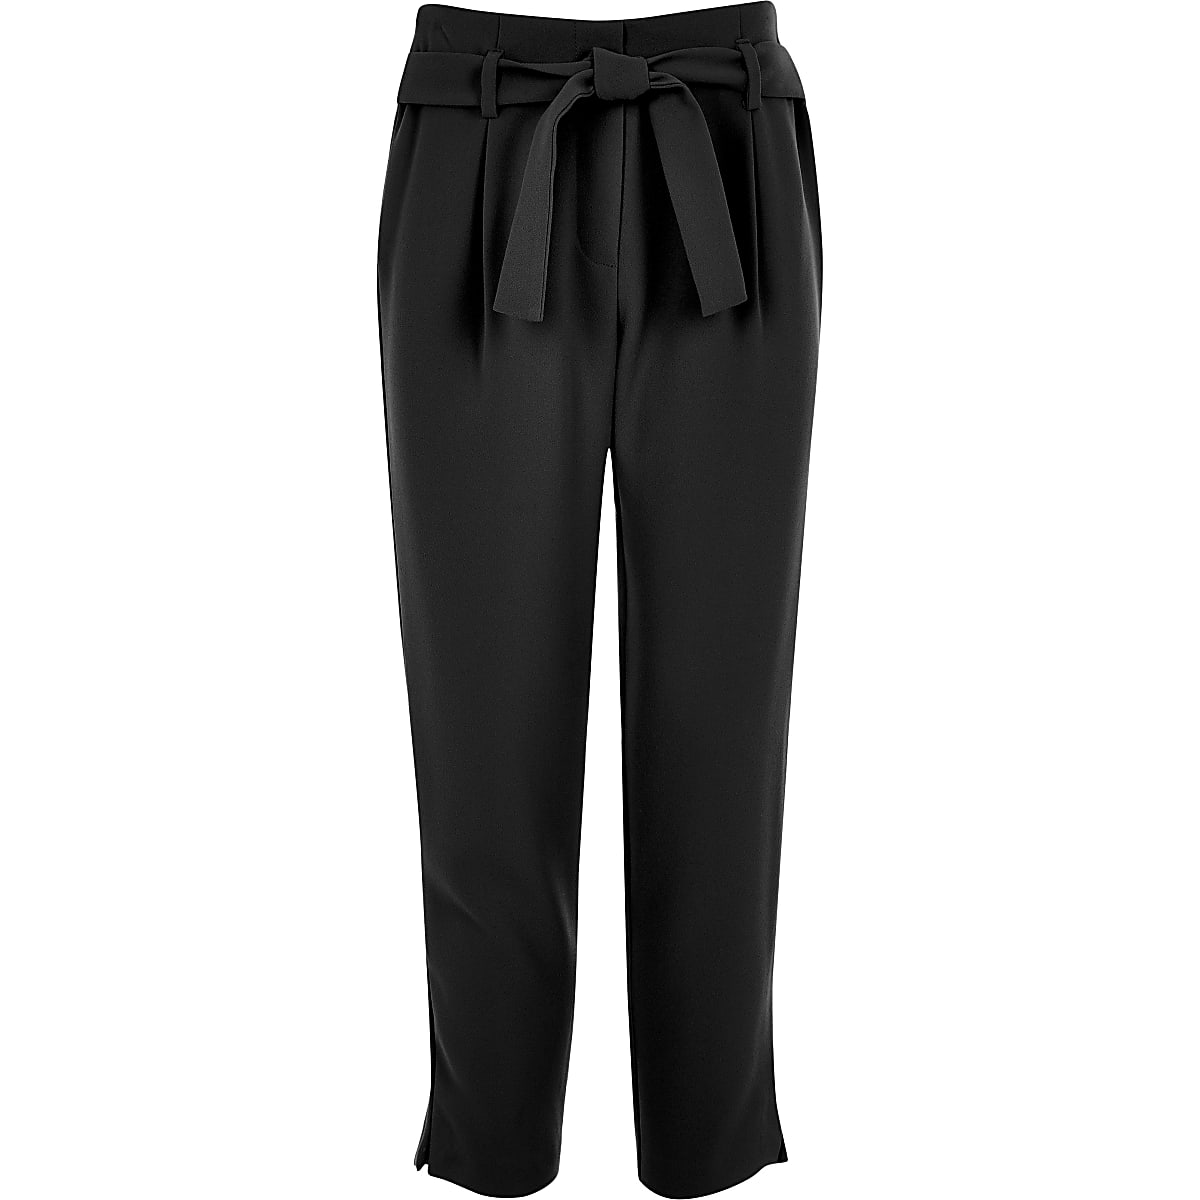 Girls black tie waist pants